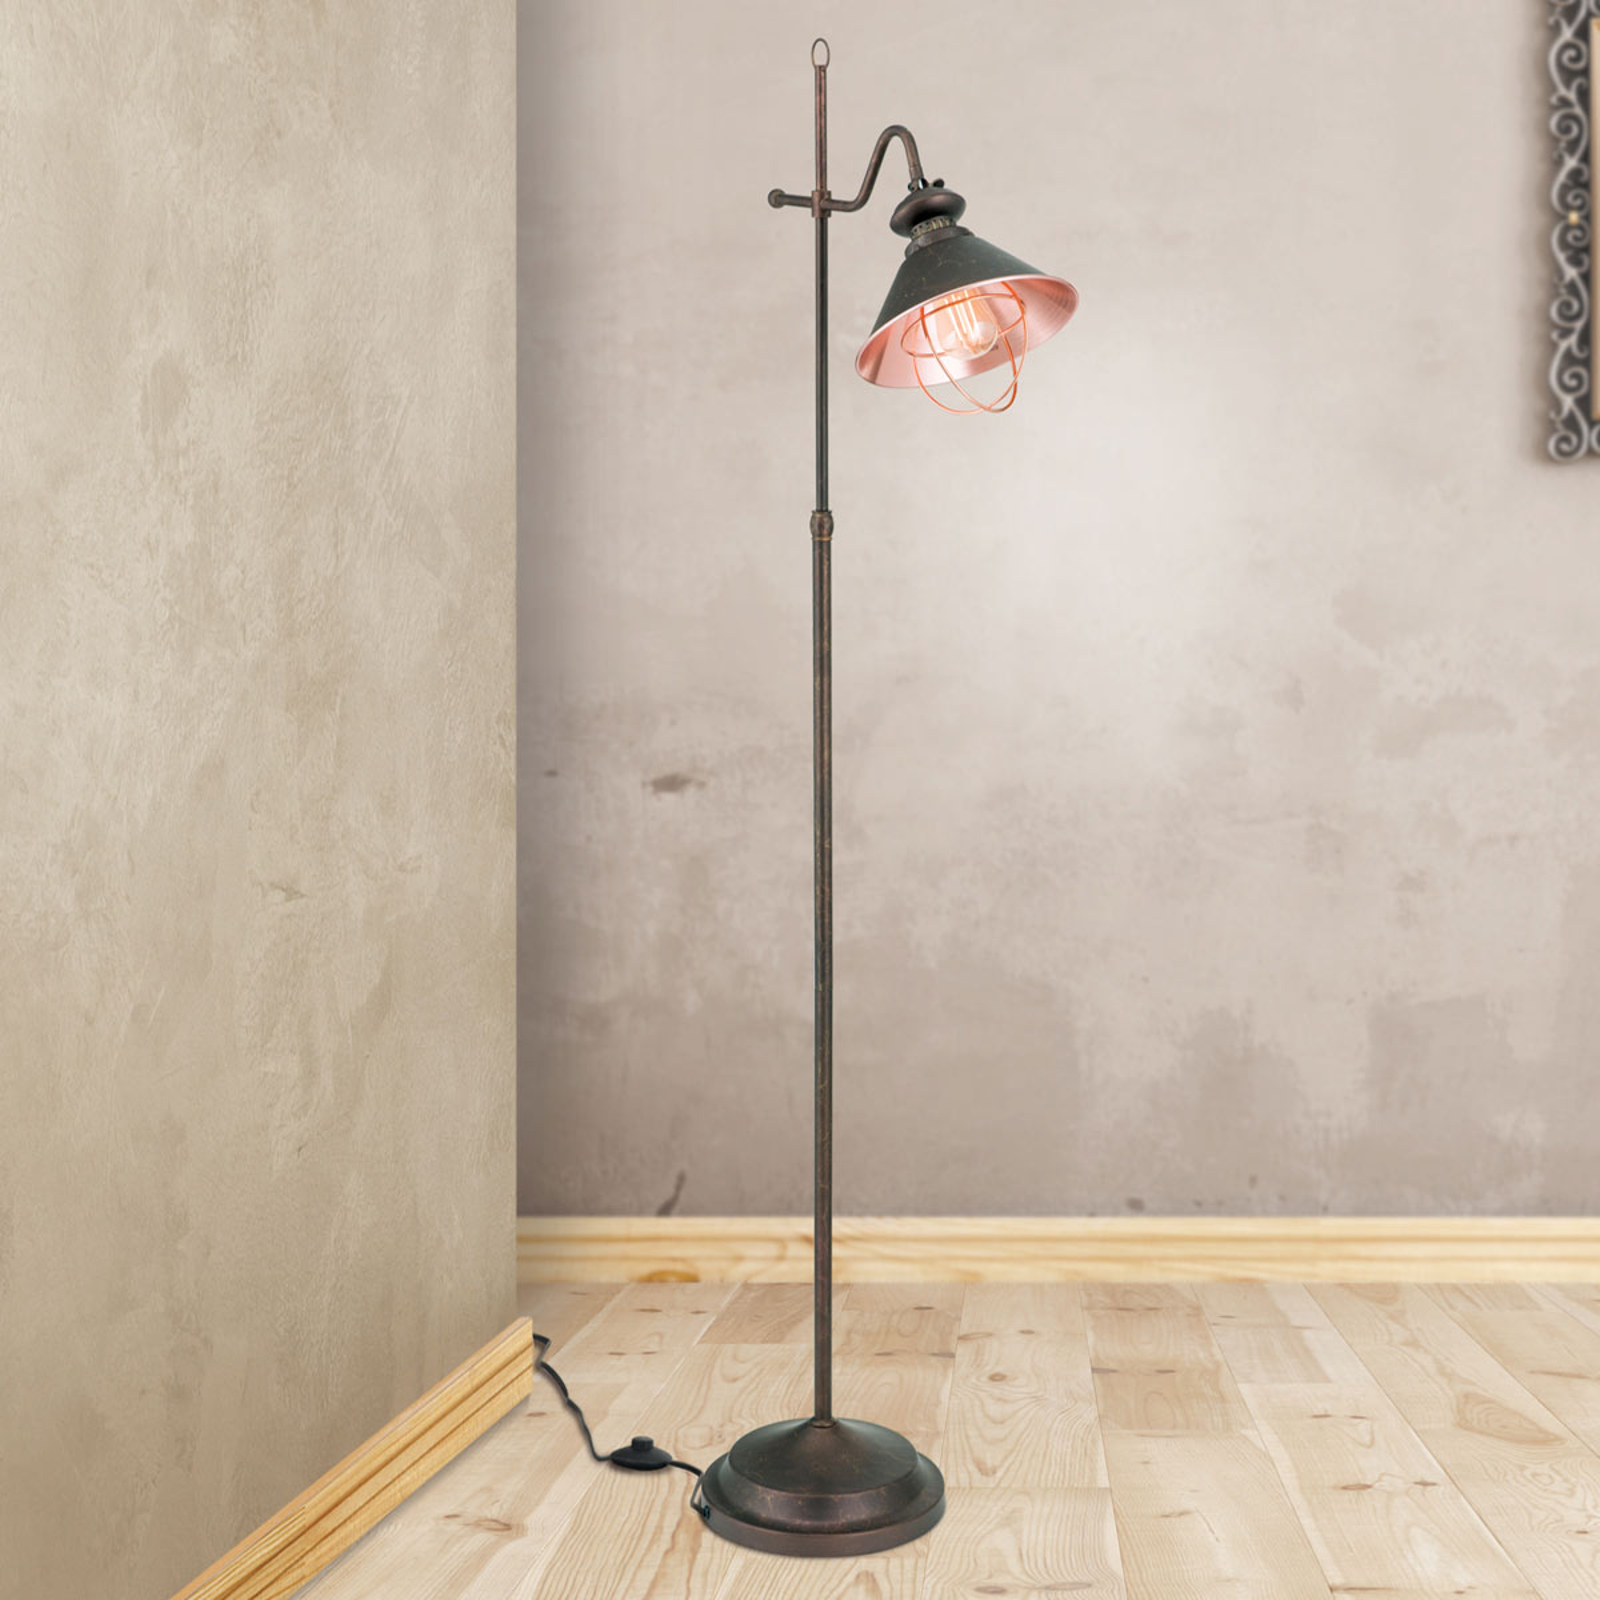 Staande lamp Shanta in antieke stijl